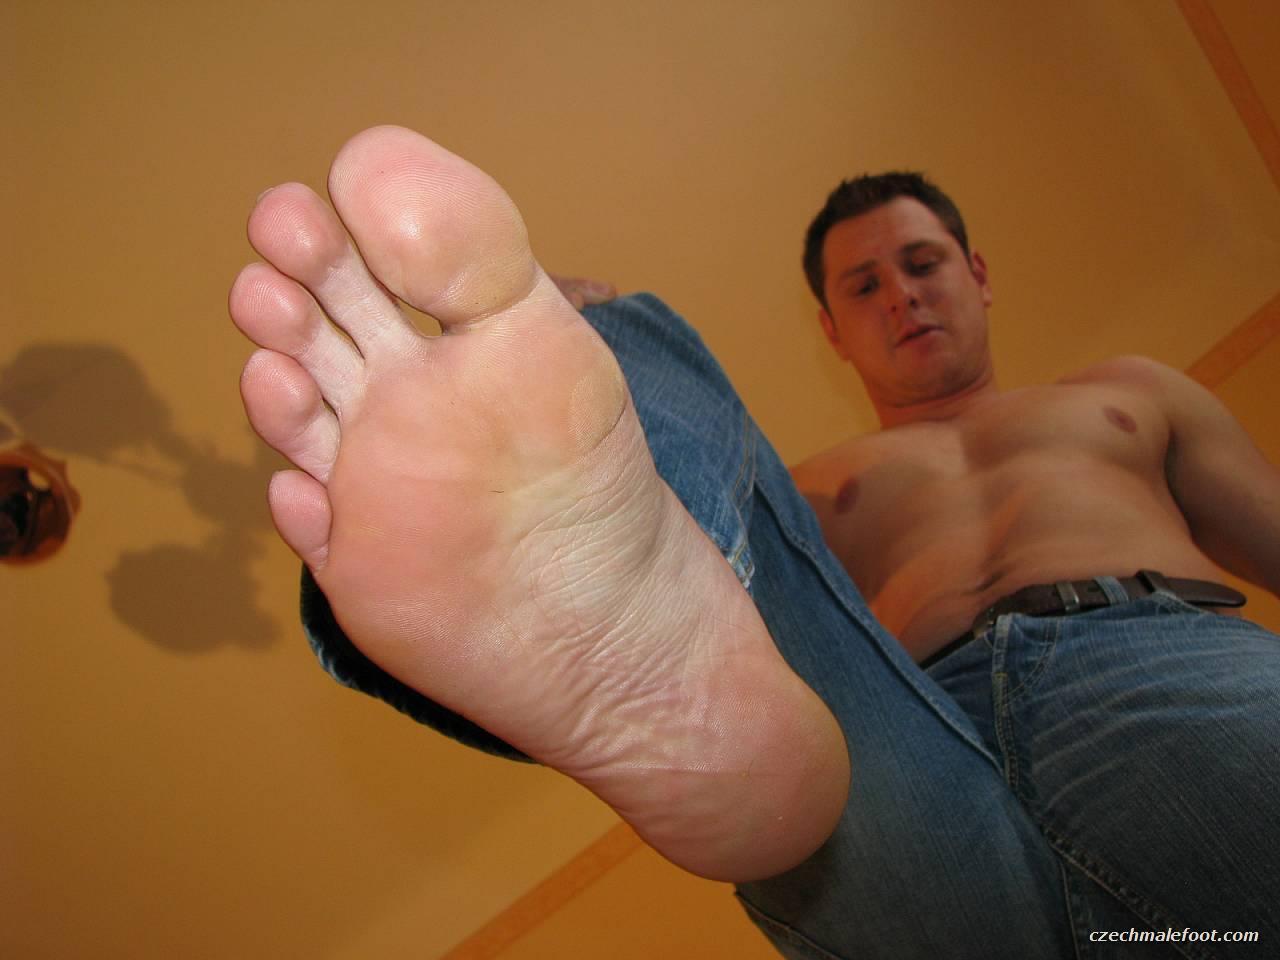 pics of feet